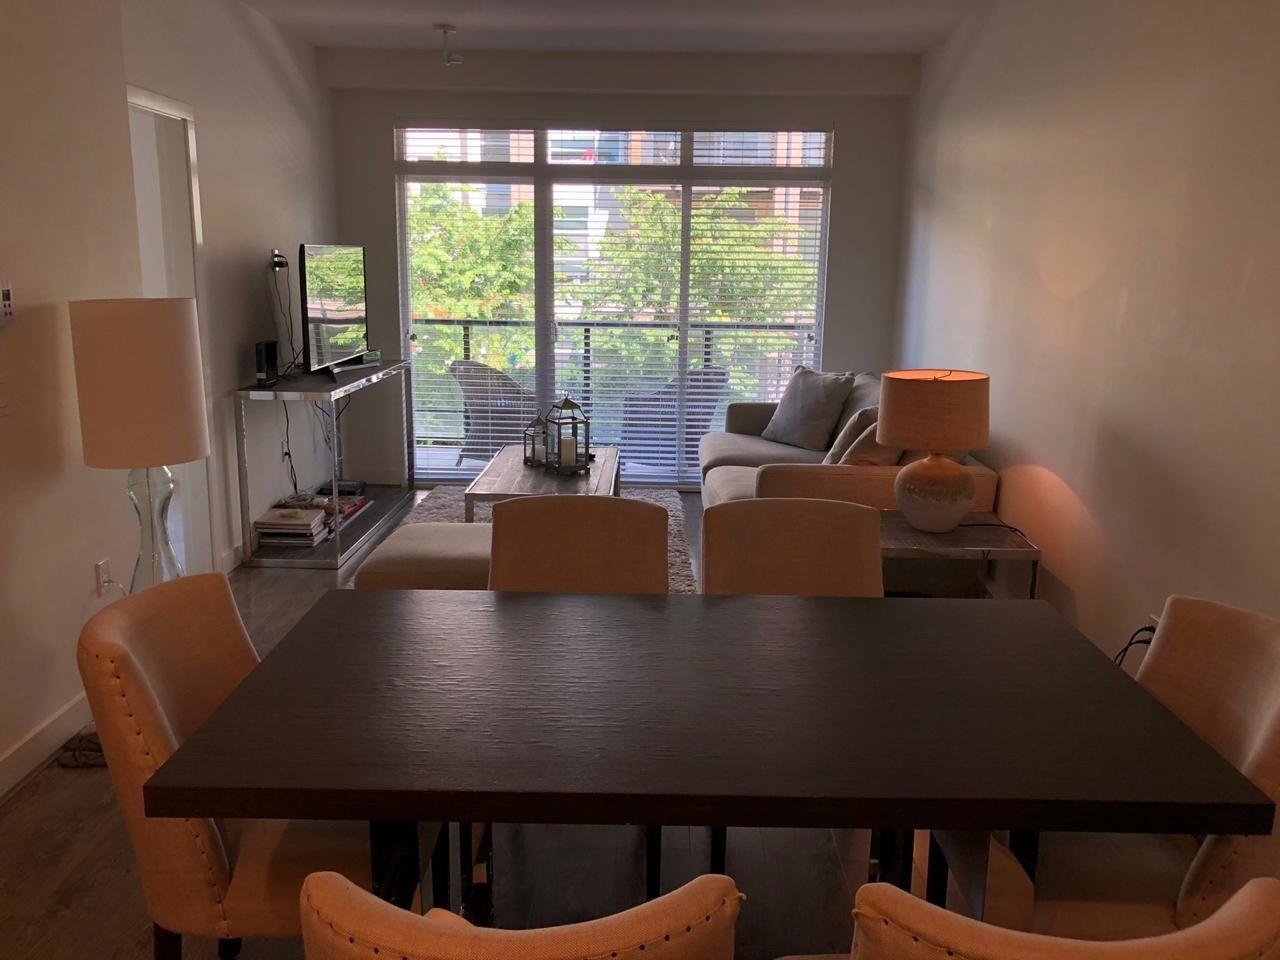 216 6033 GRAY AVENUE - University VW Apartment/Condo for sale, 2 Bedrooms (R2605445) - #1